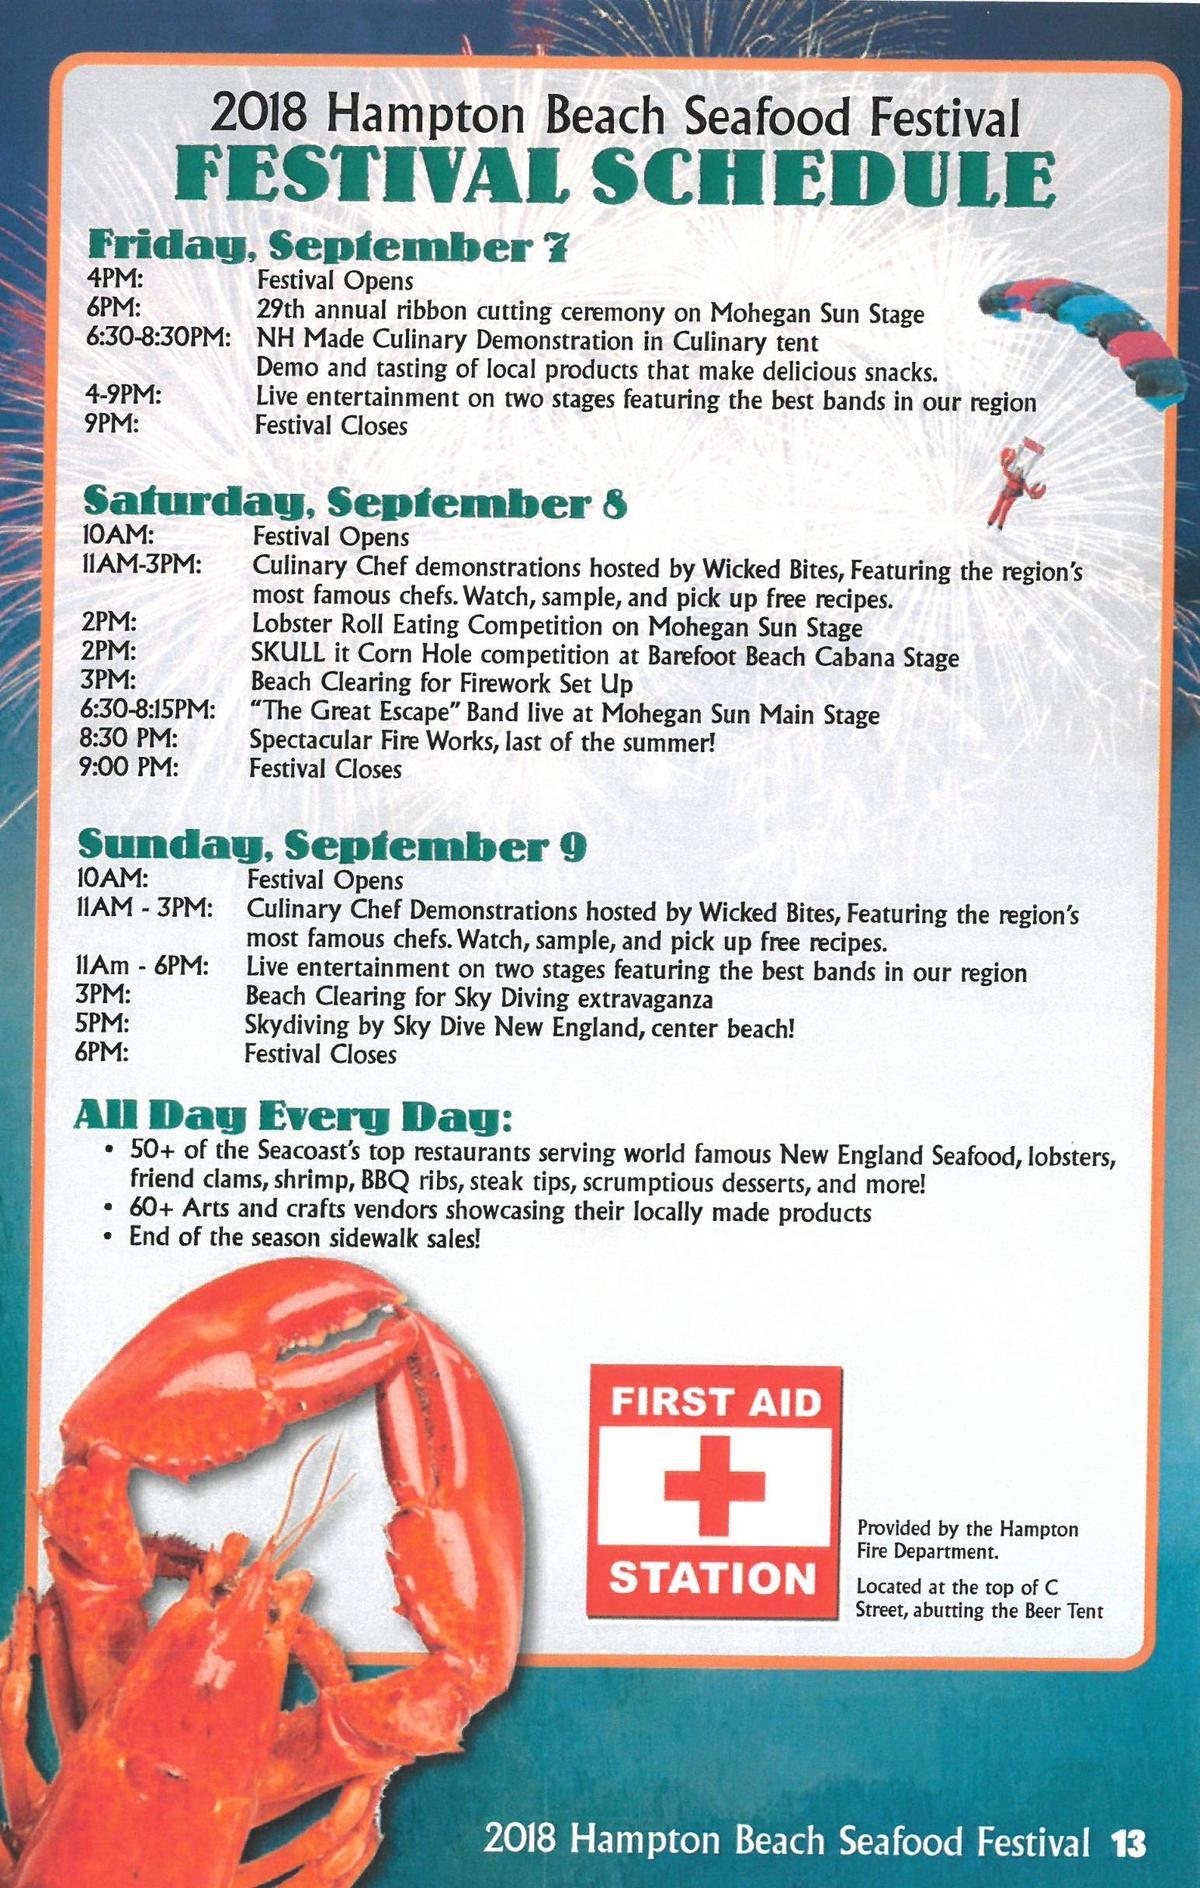 Hampton Beach Seafood Festival This Weekend: Full Schedule